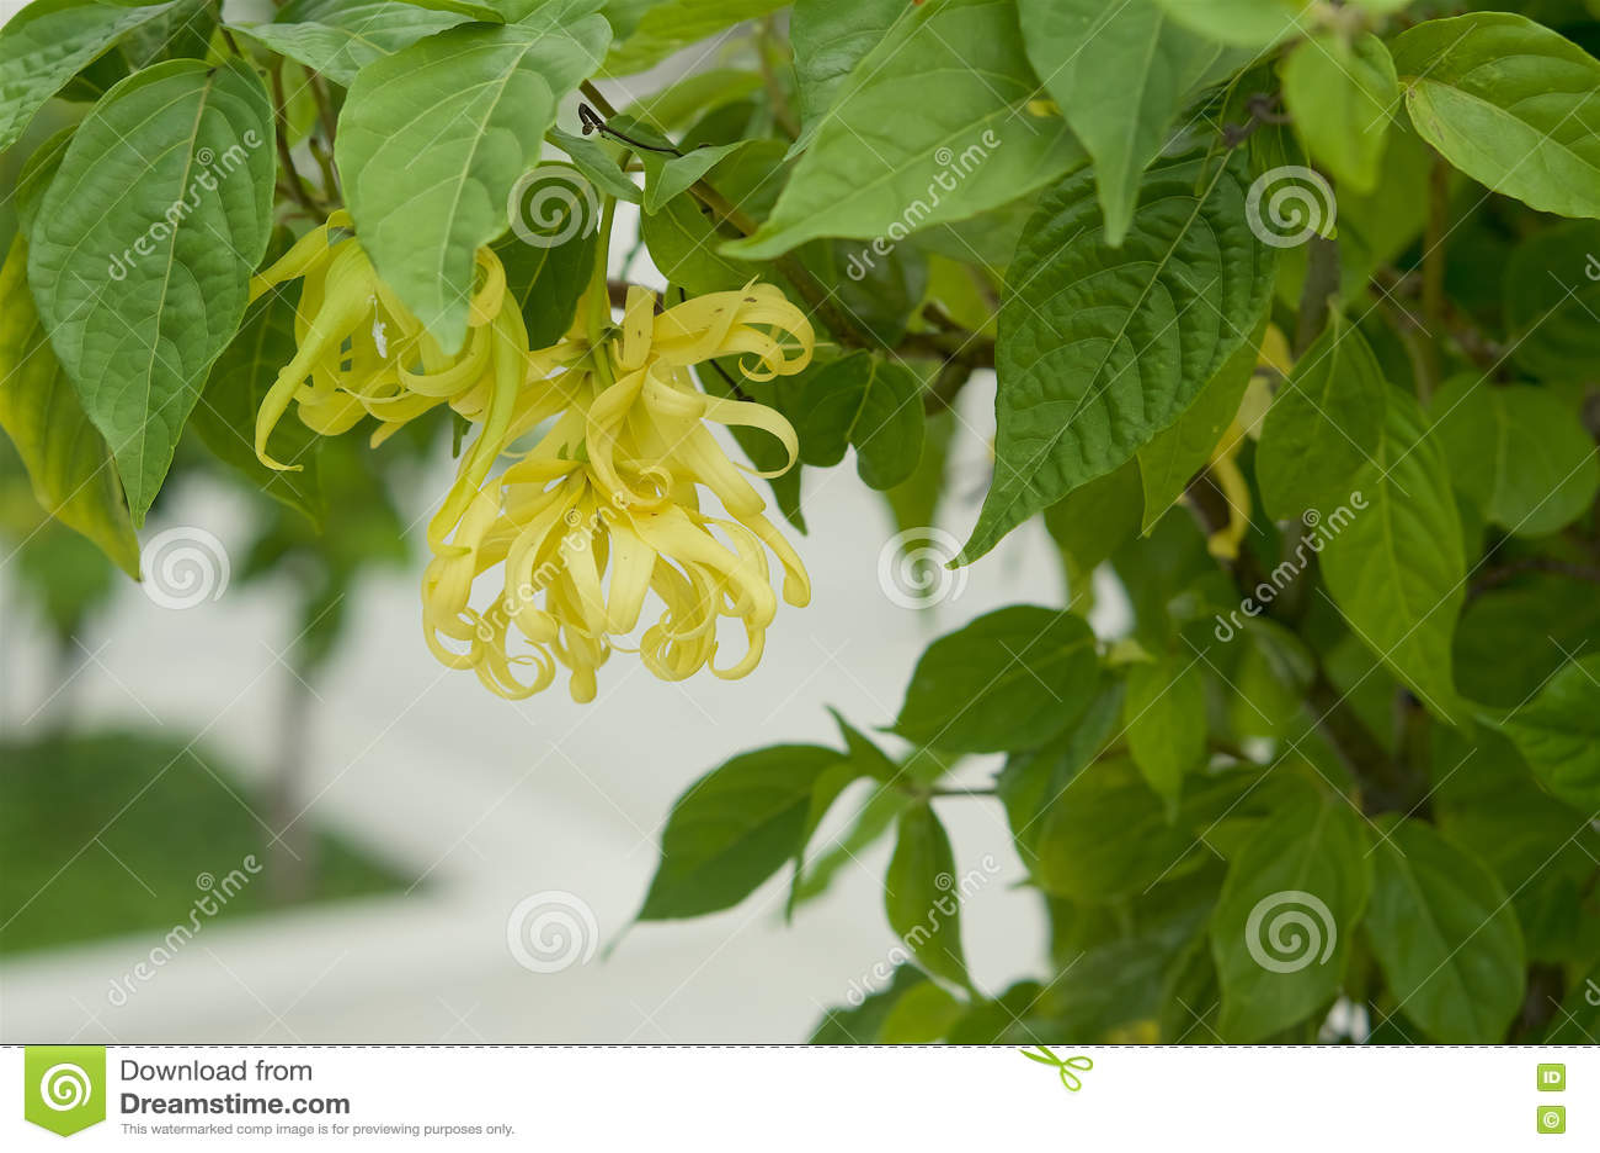 Ilang-Ilang Blume auf Baum